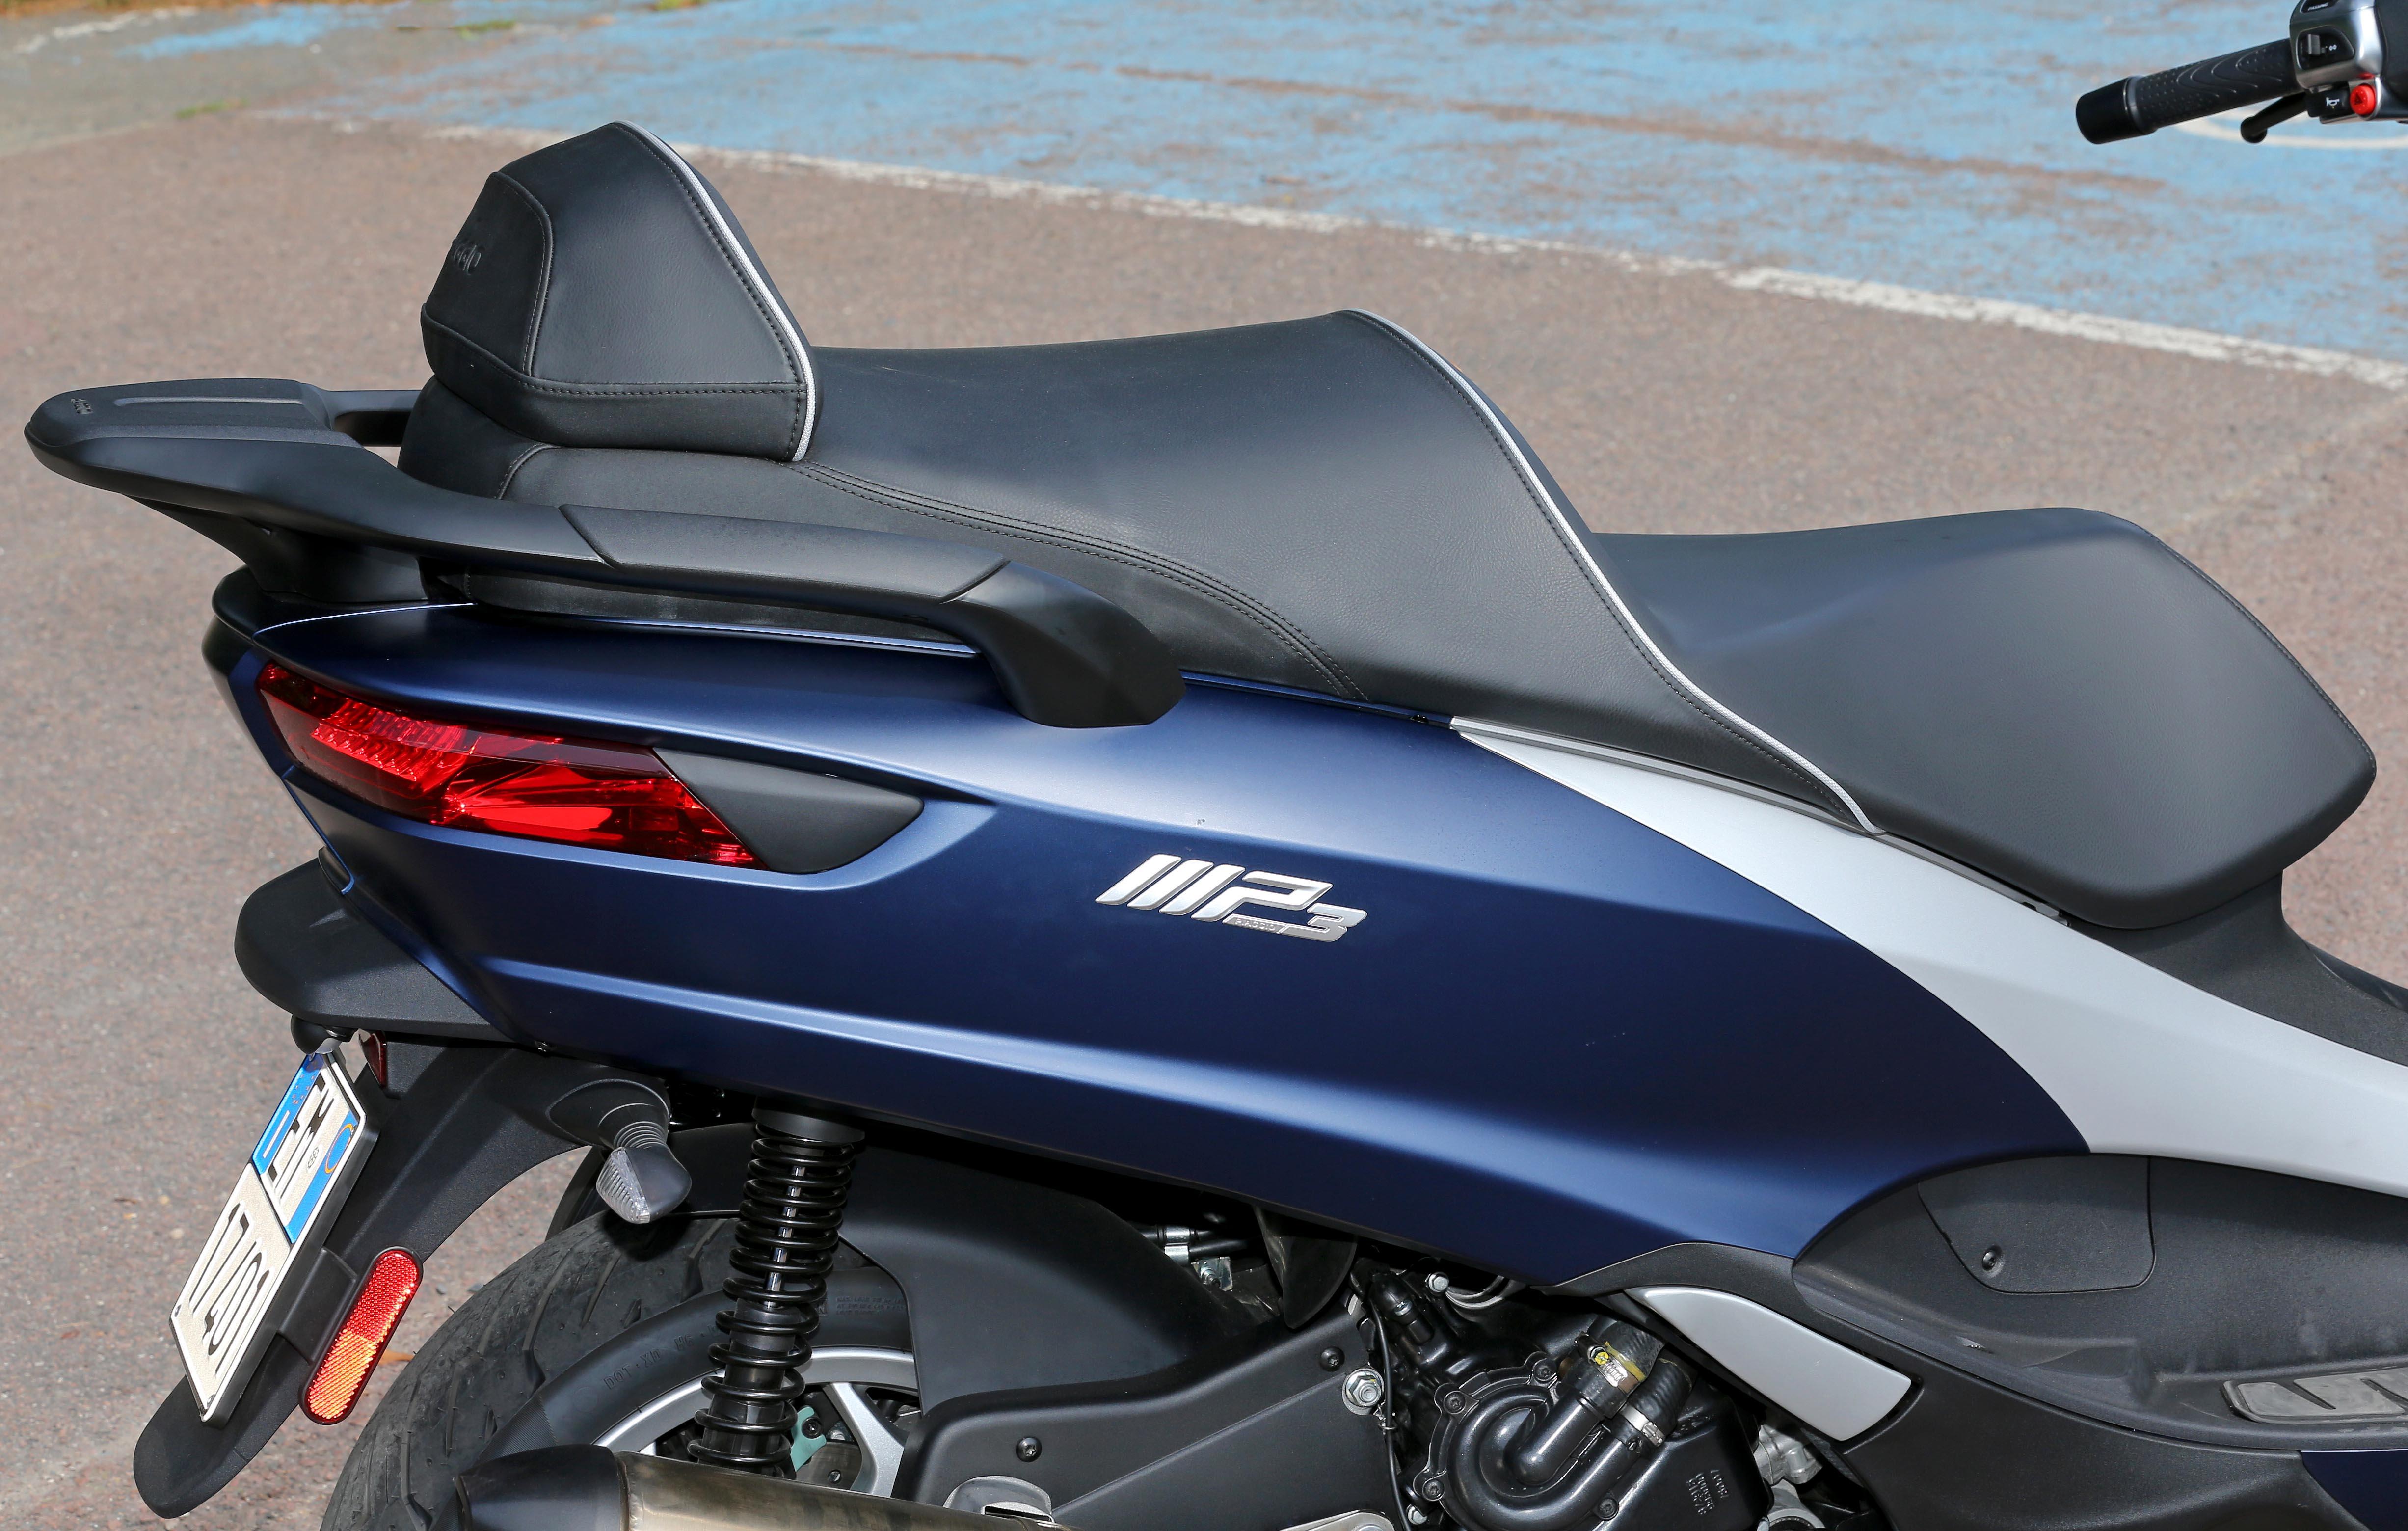 MP 3 500 hpe